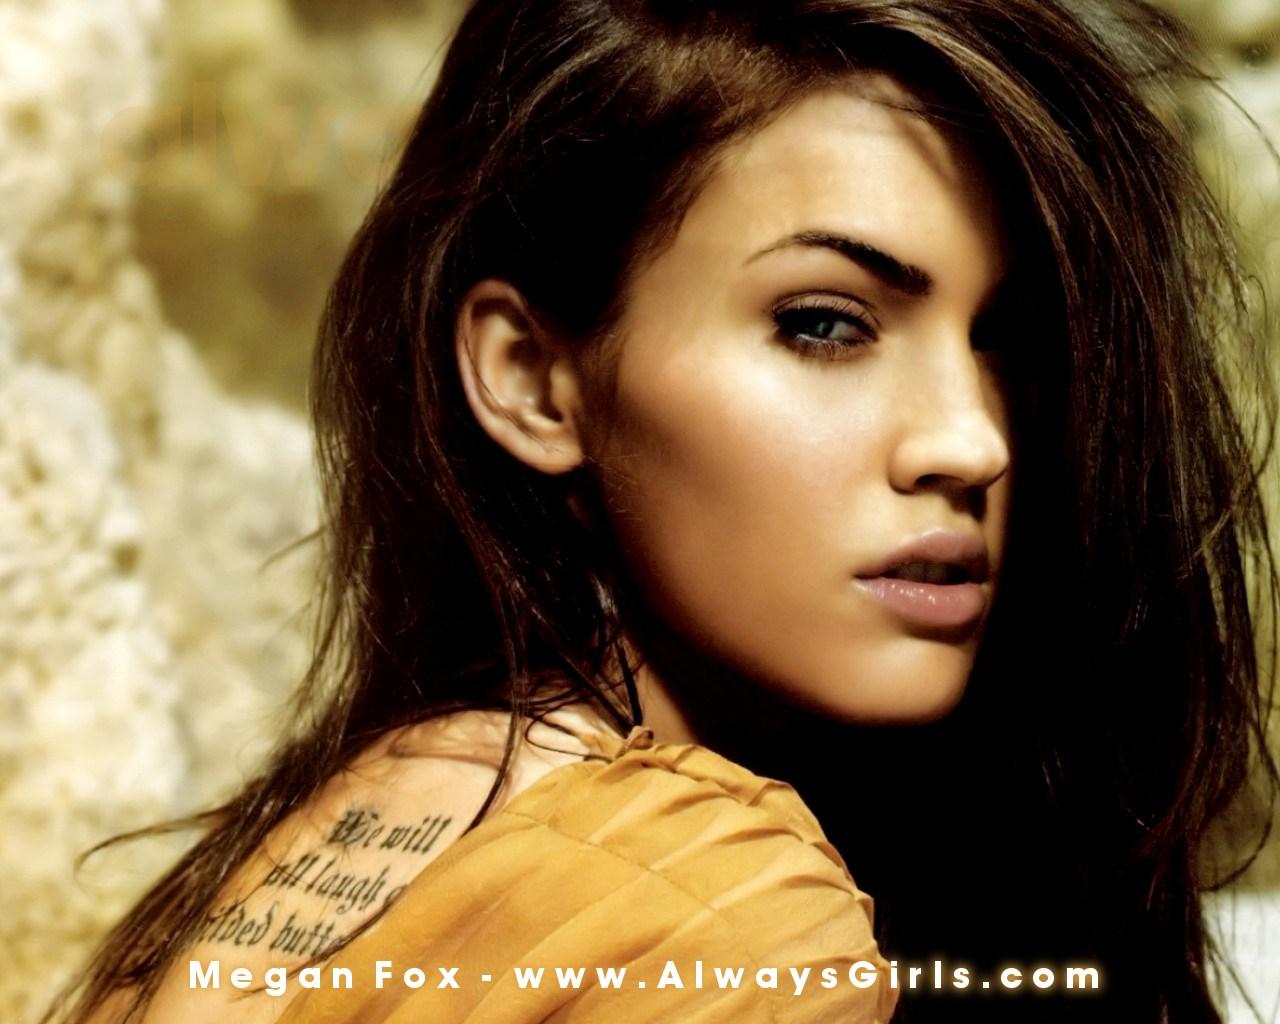 http://4.bp.blogspot.com/-ldHR4Hfwj0U/T-87DdjWO6I/AAAAAAAAAZE/EMnyLzAAfcc/s1600/Megan-Fox-15.jpg